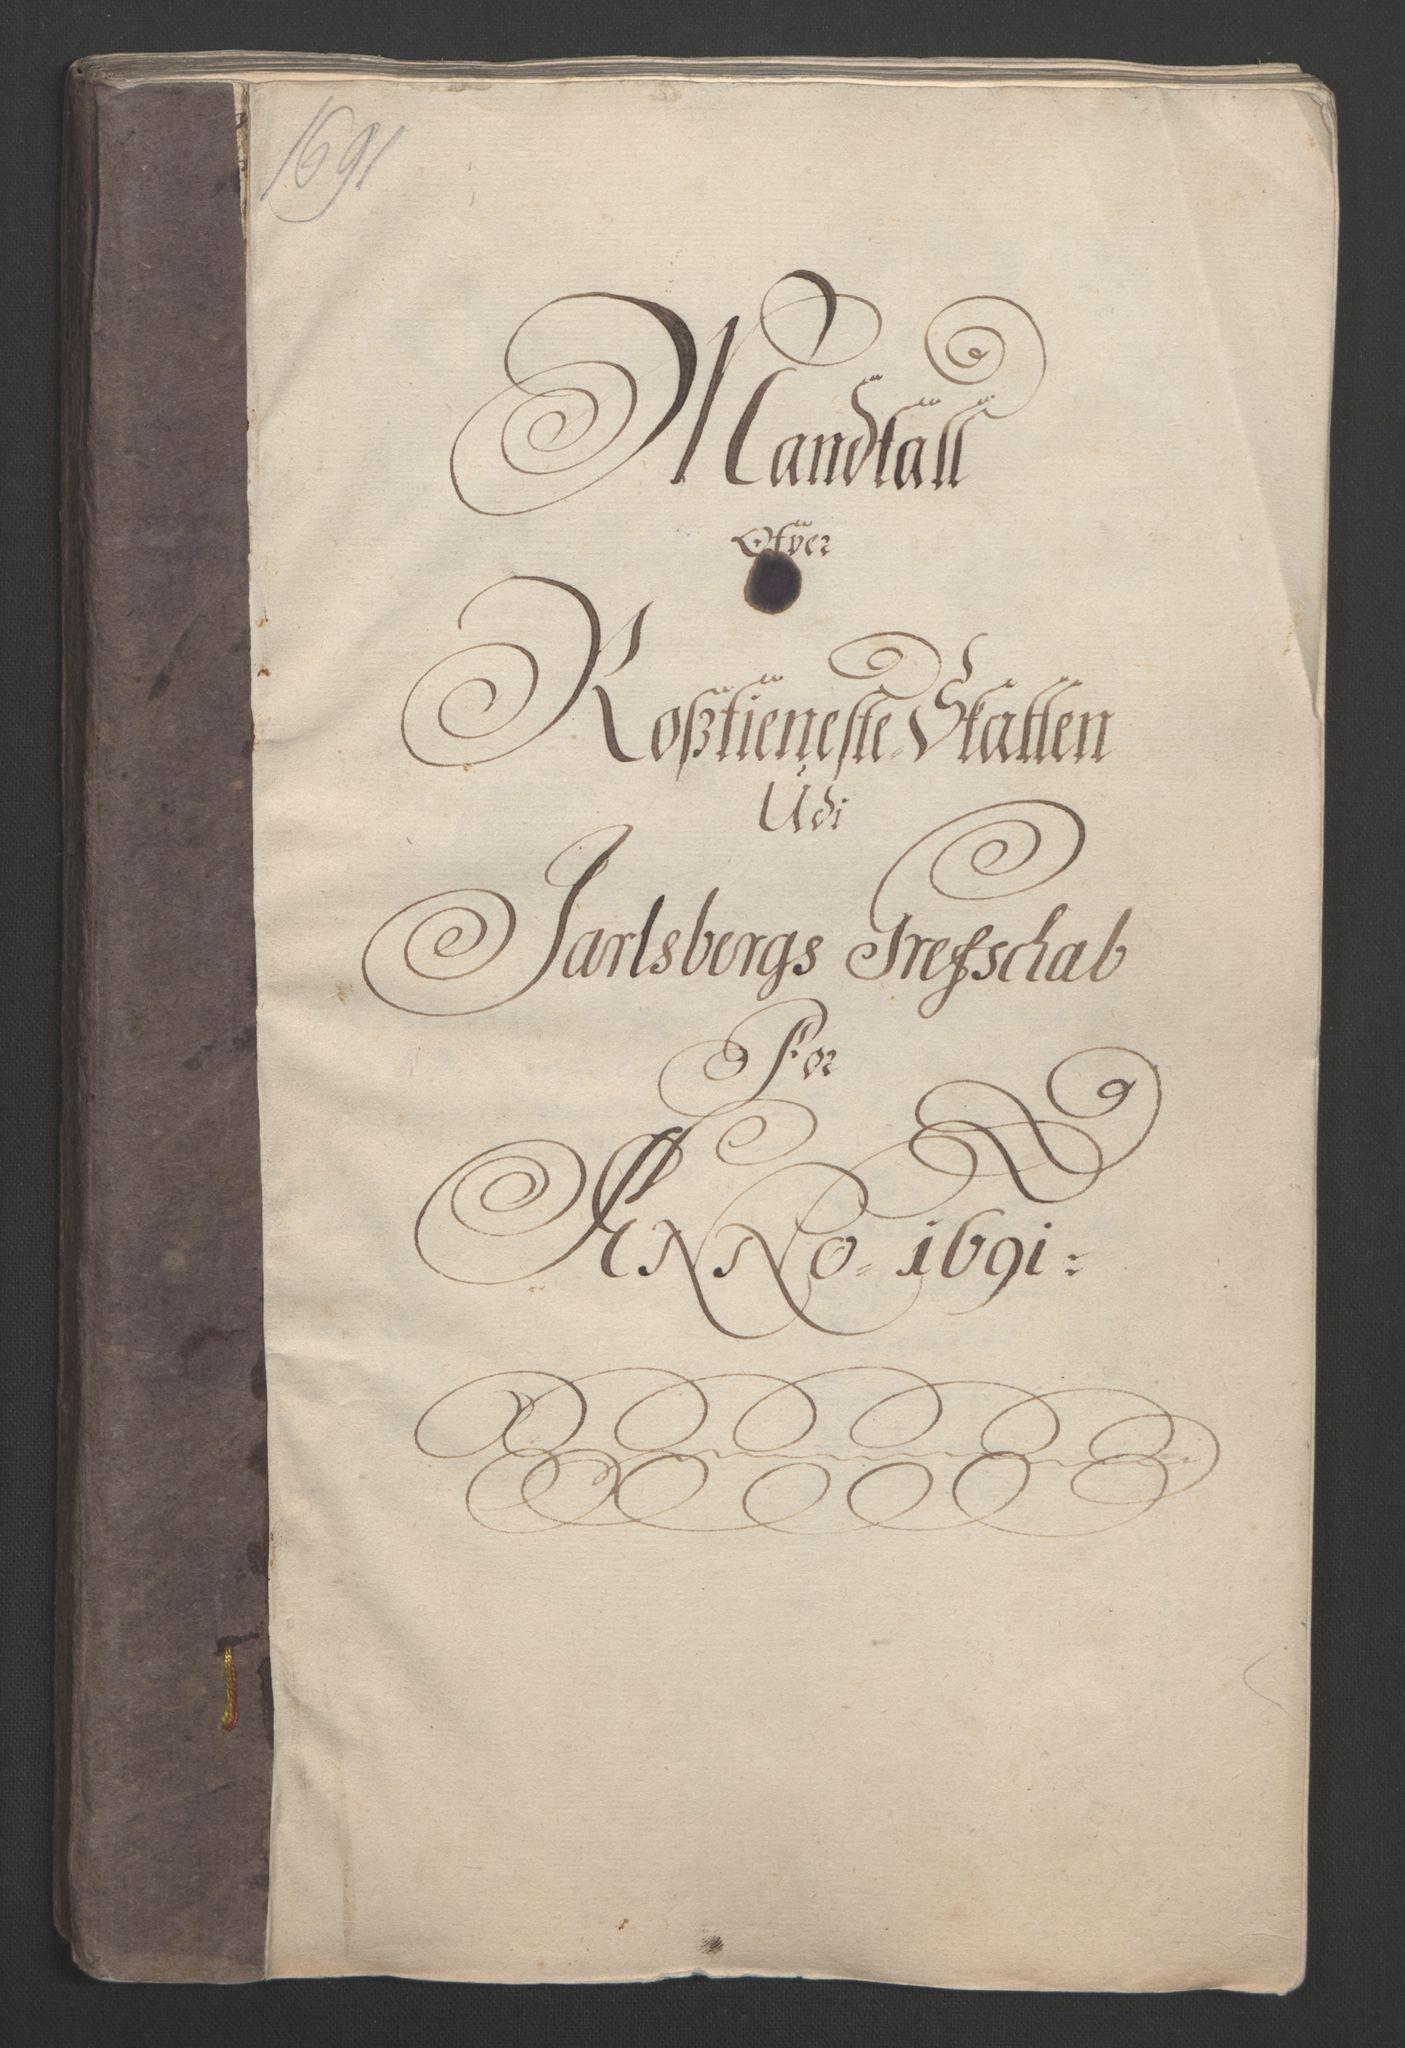 RA, Rentekammeret inntil 1814, Reviderte regnskaper, Fogderegnskap, R32/L1864: Fogderegnskap Jarlsberg grevskap, 1691, s. 243